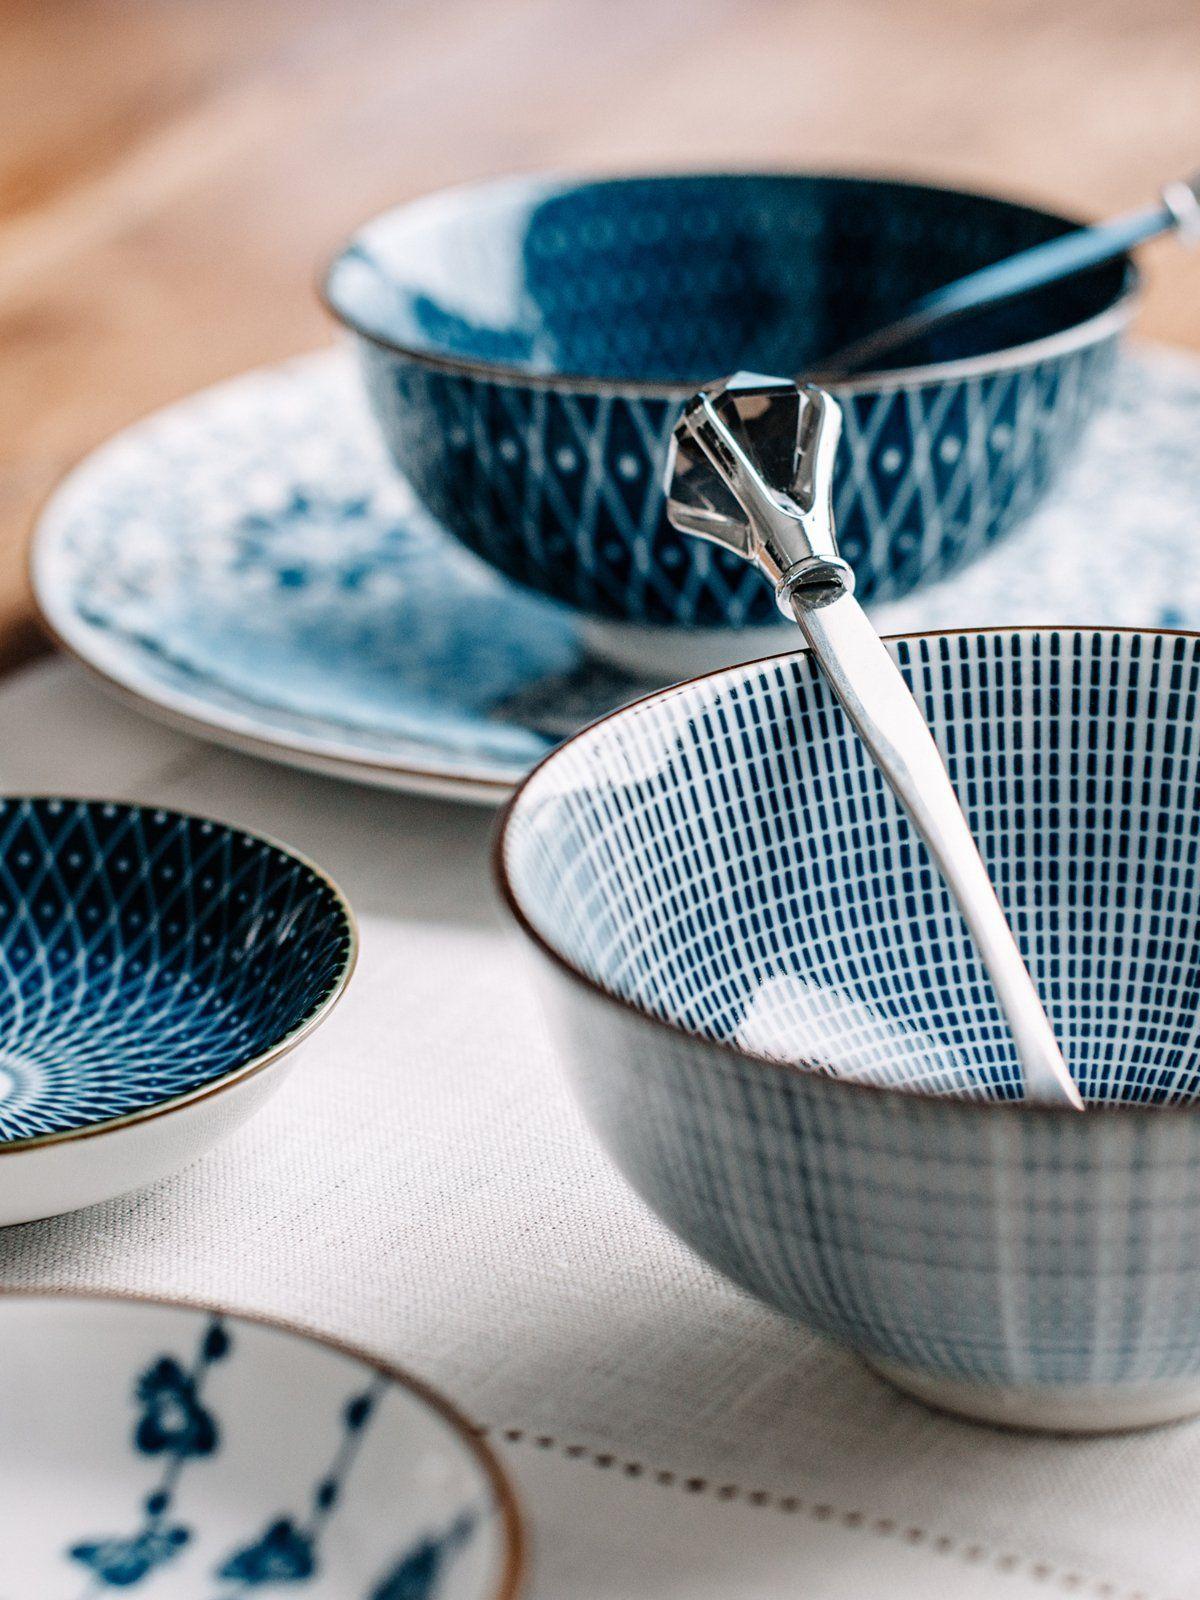 Dieses Geschirr Passt Zu Jedem Anlass Geschirr Schones Geschirr Blau Muster